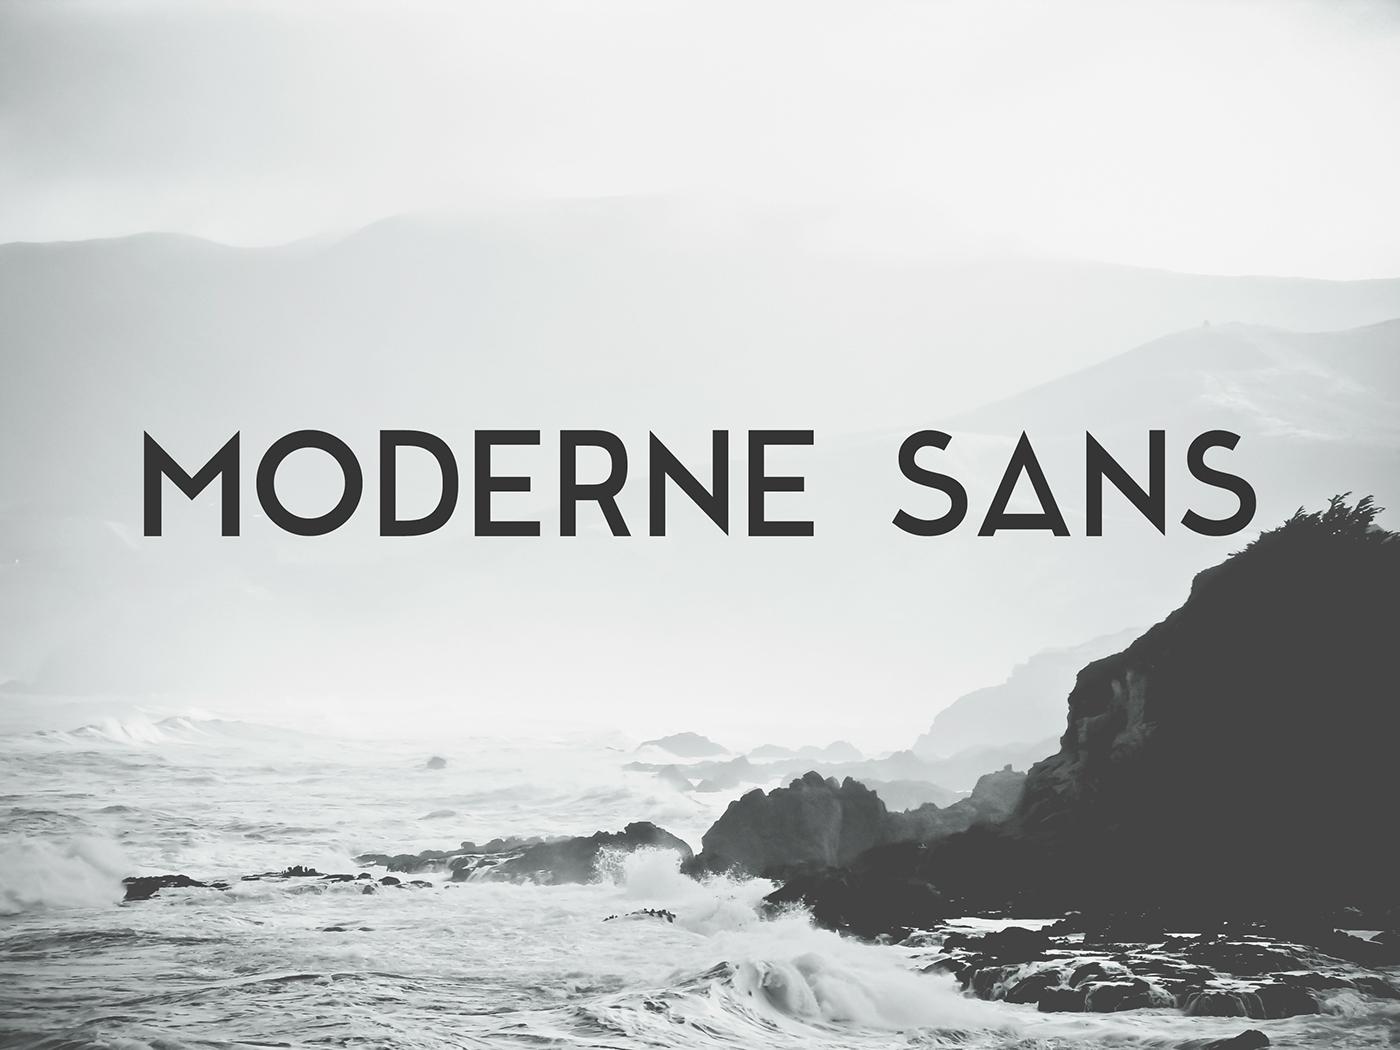 font sans-serif grotesk grotesque clean modern moderne sans Typeface